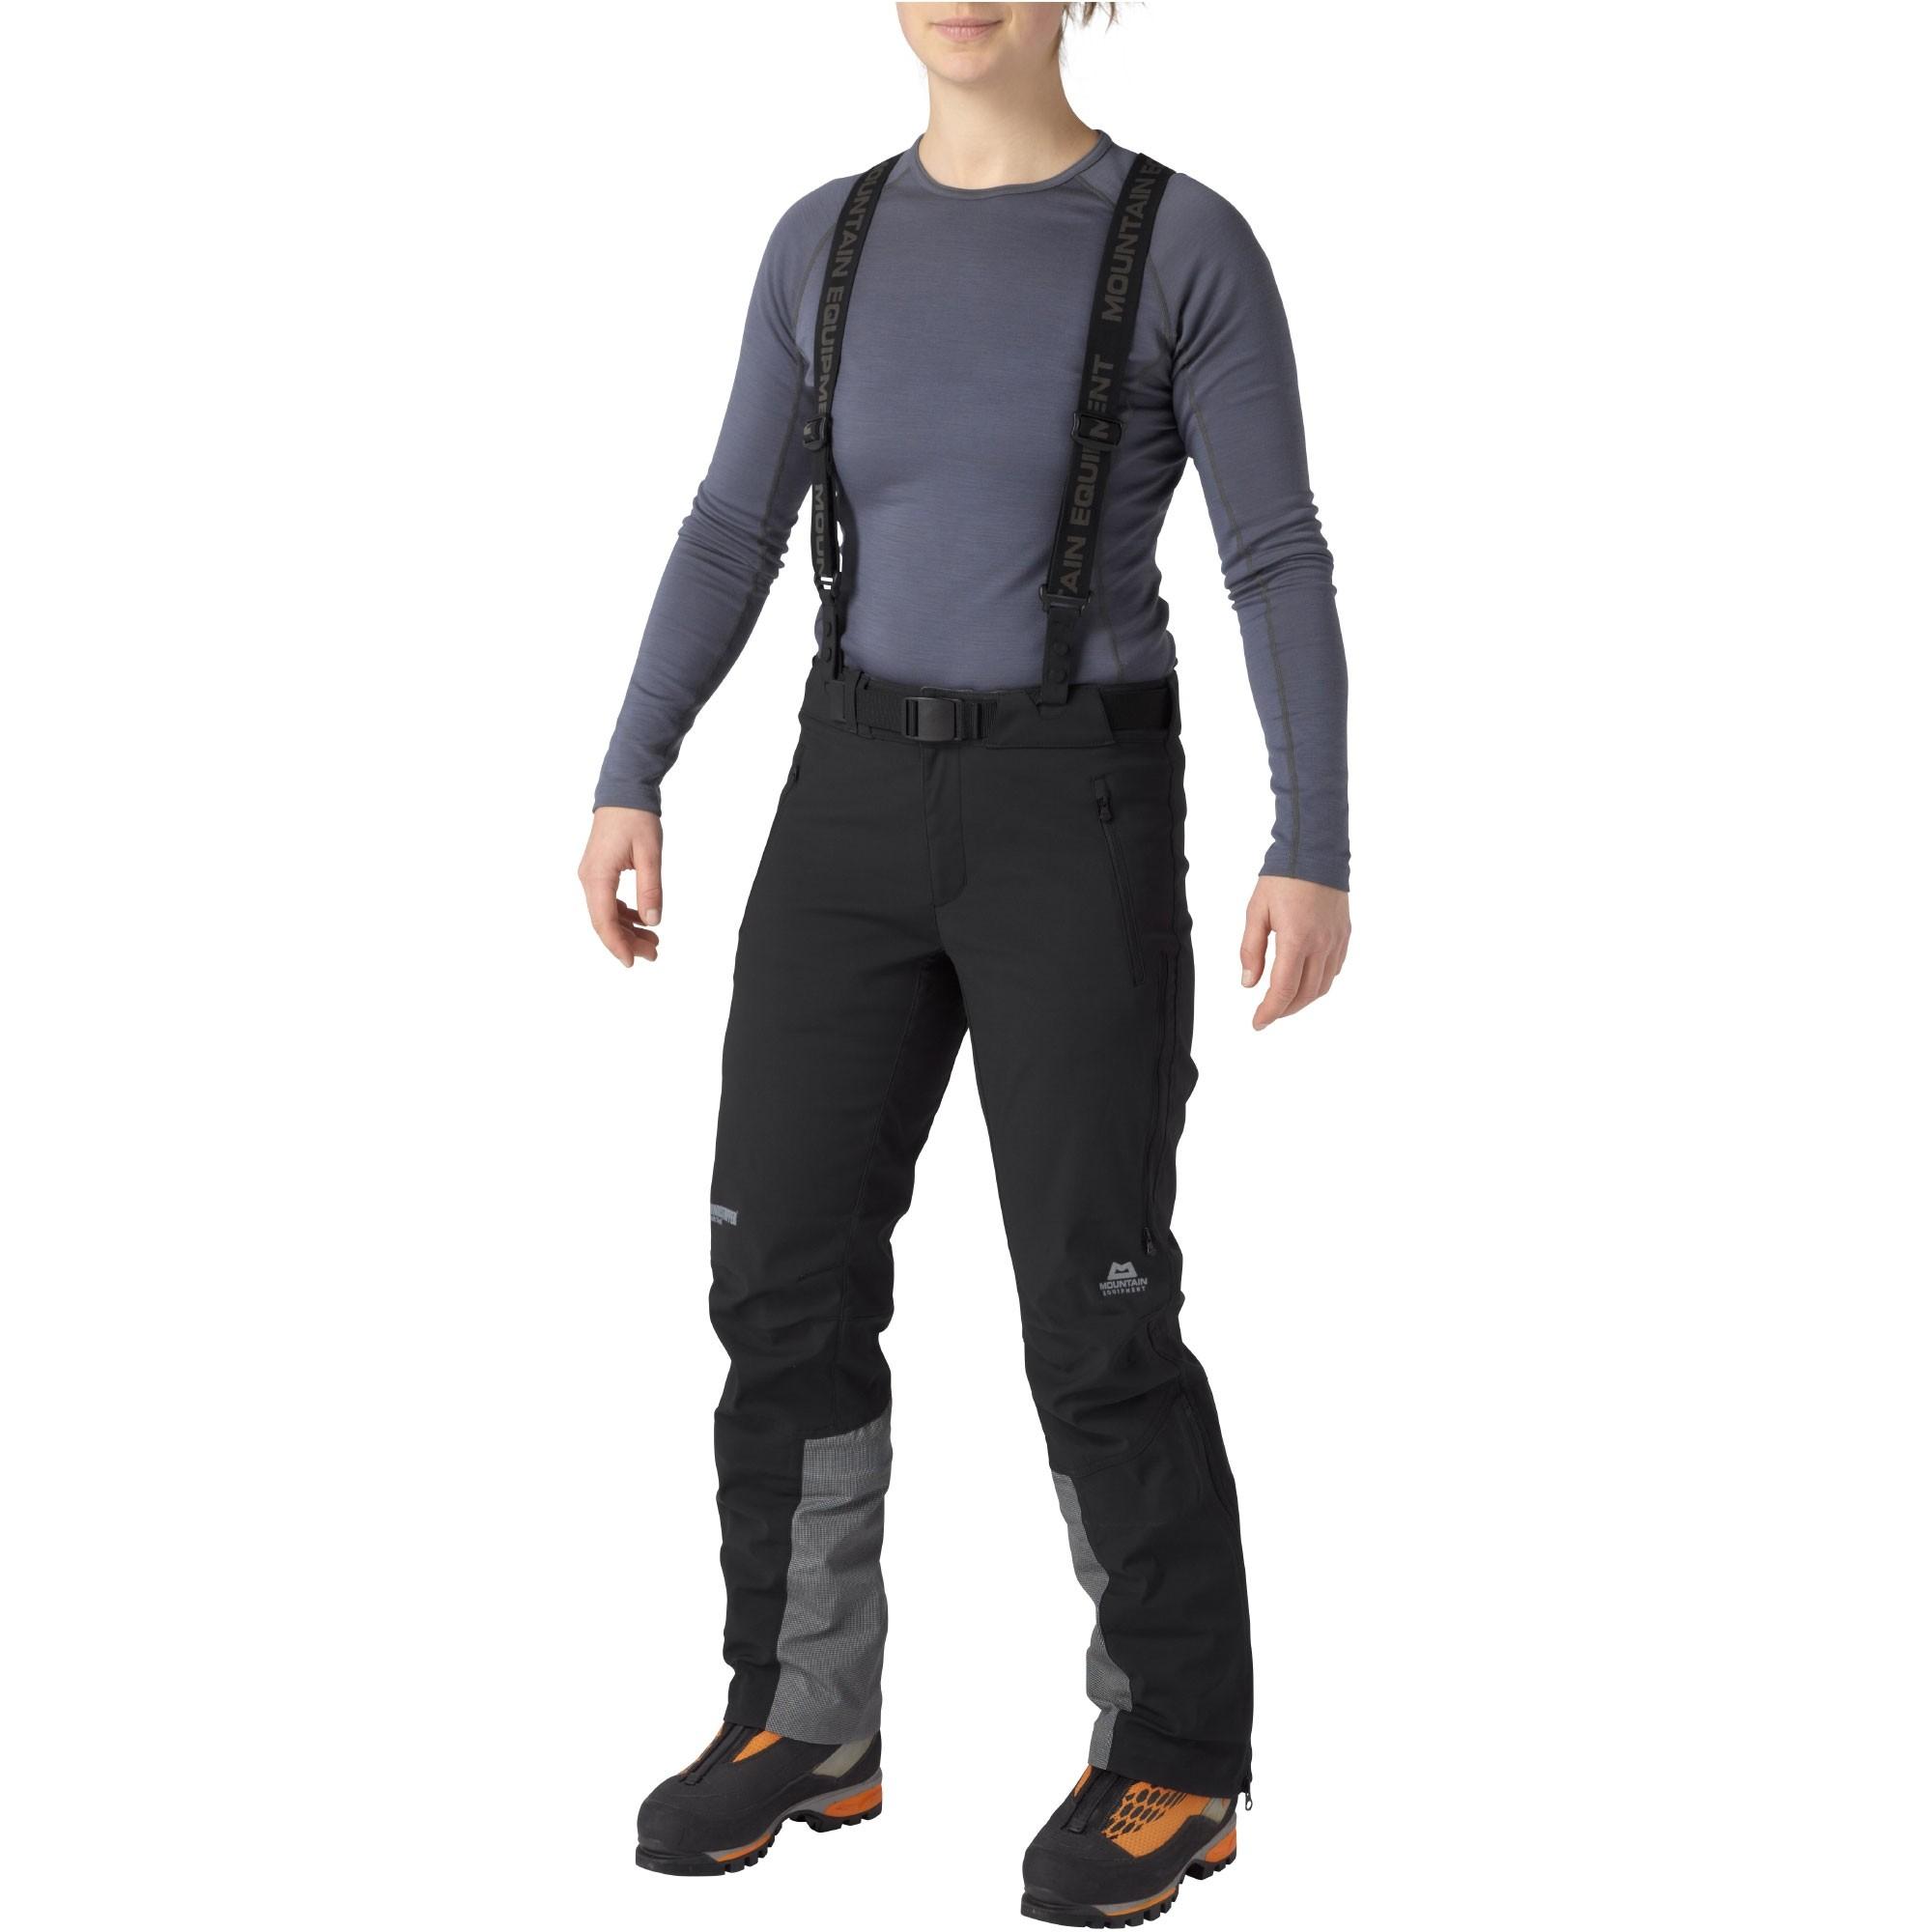 Mountain Equipment G2 Women's Mountain Pant - Black - Front